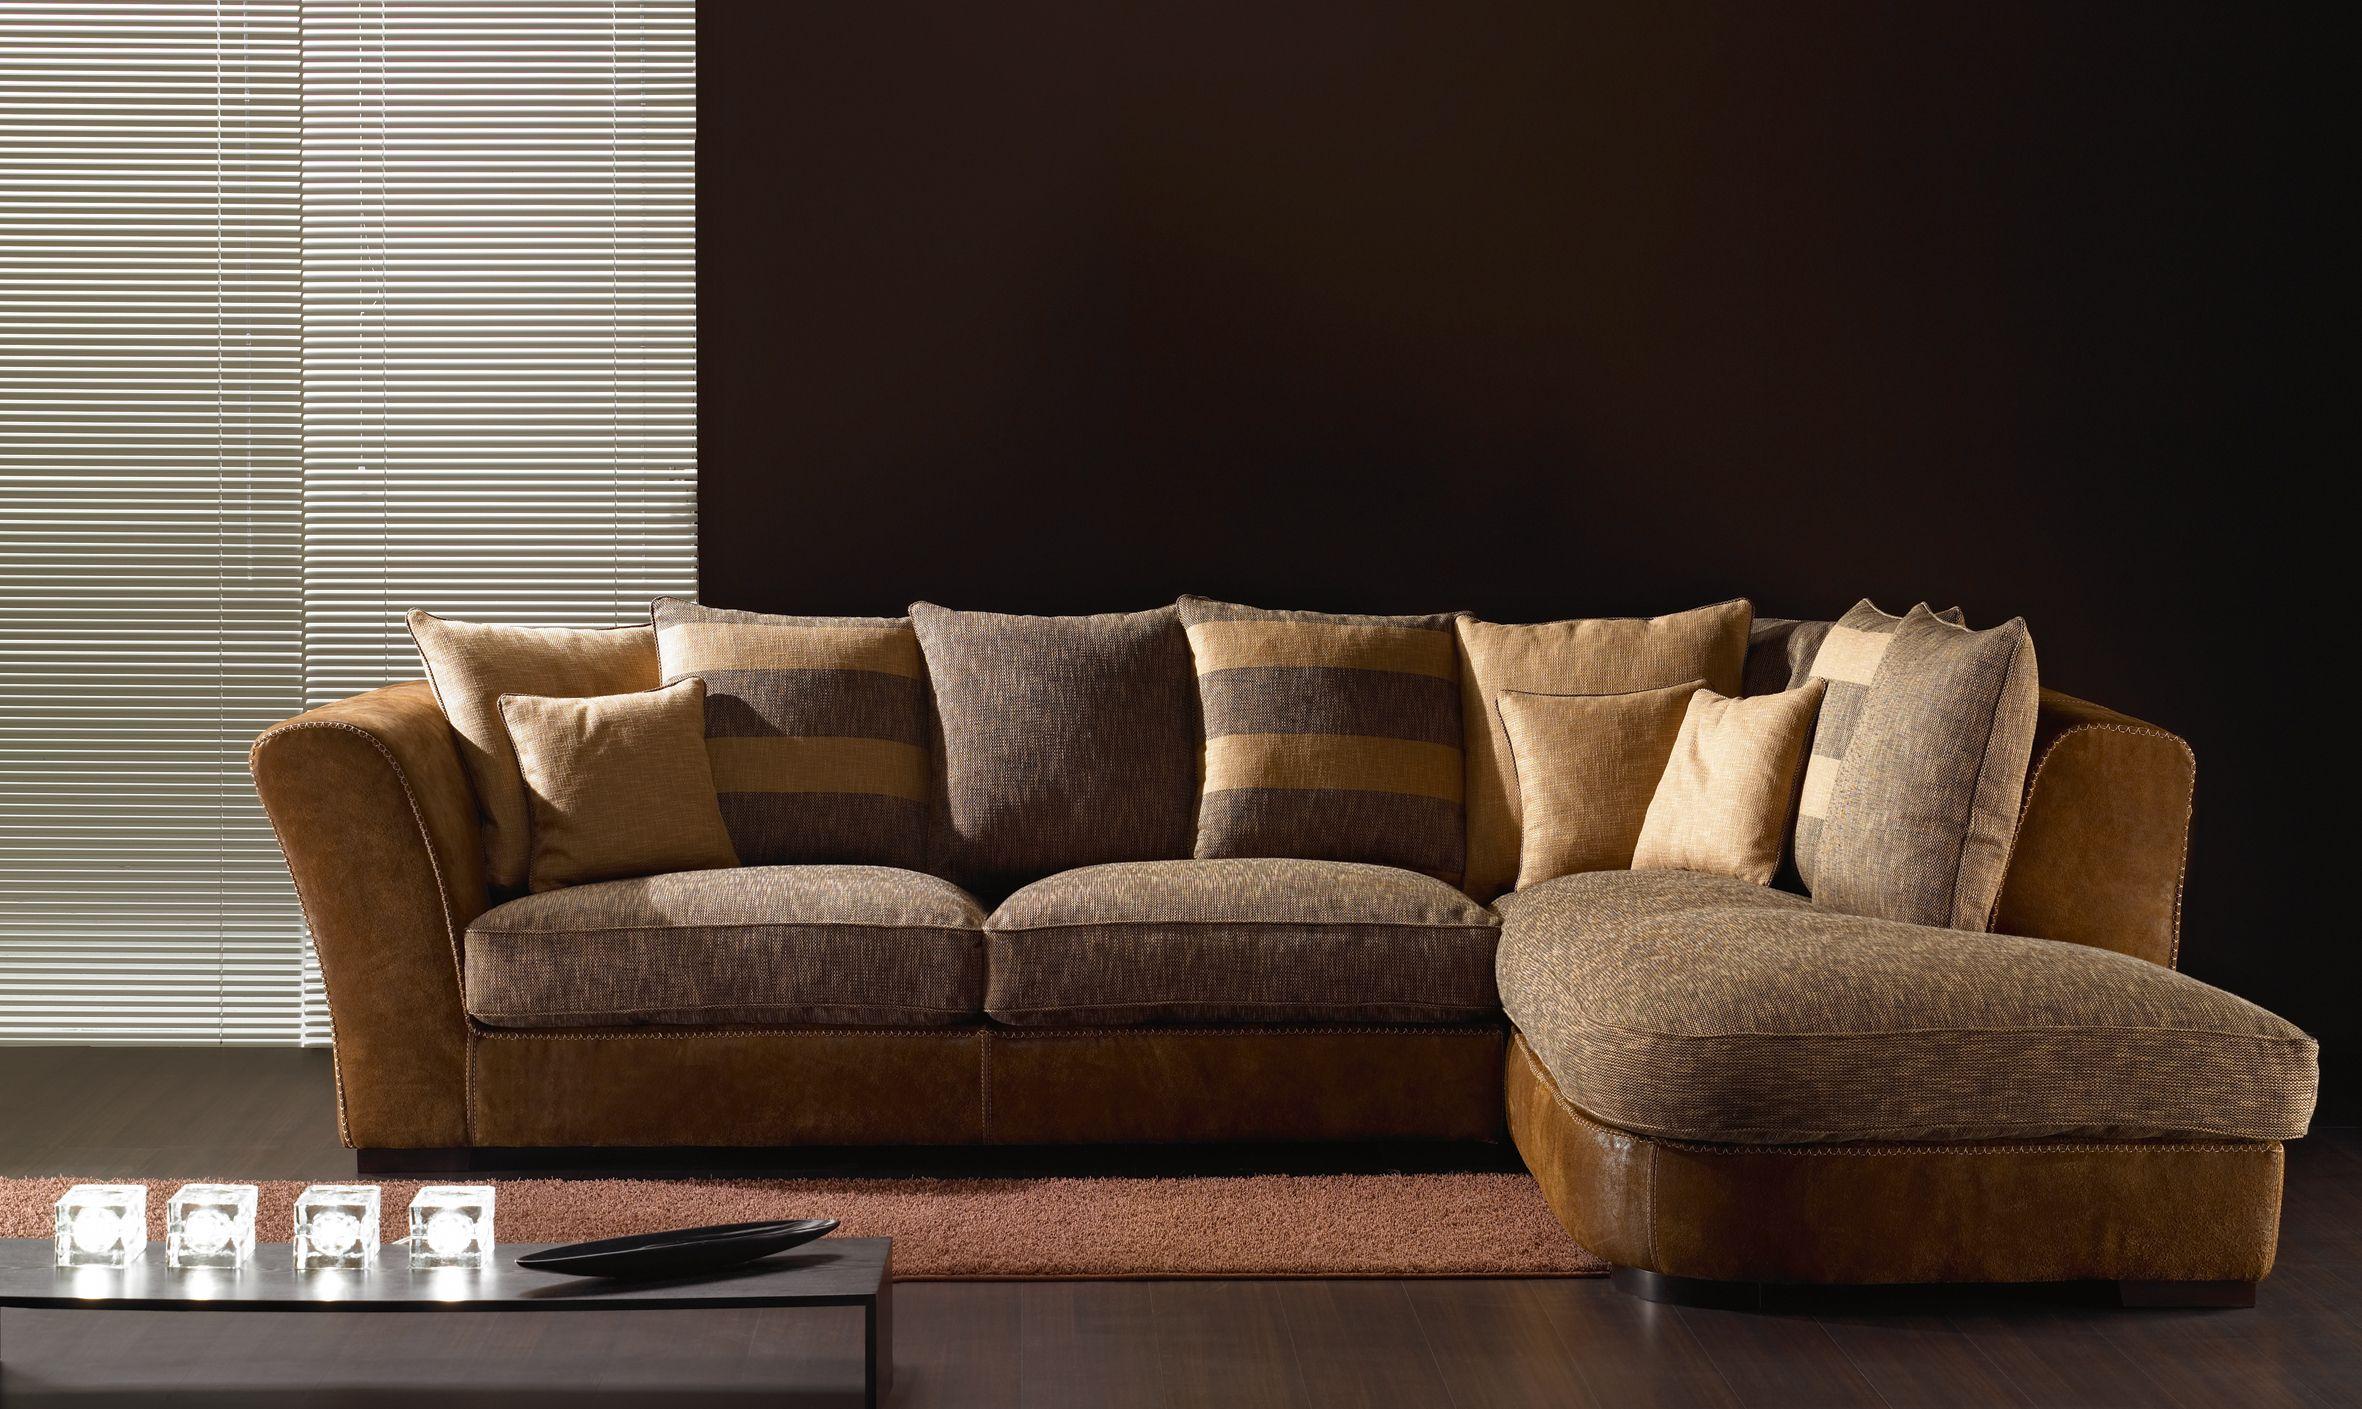 A Corner Sofa At Mouhajer Showroom In Dubai By Mouhajer International Design Follow Us On Instagram Mouhajerdesign Facebook Mouhajer In Furniture Sofa Decor